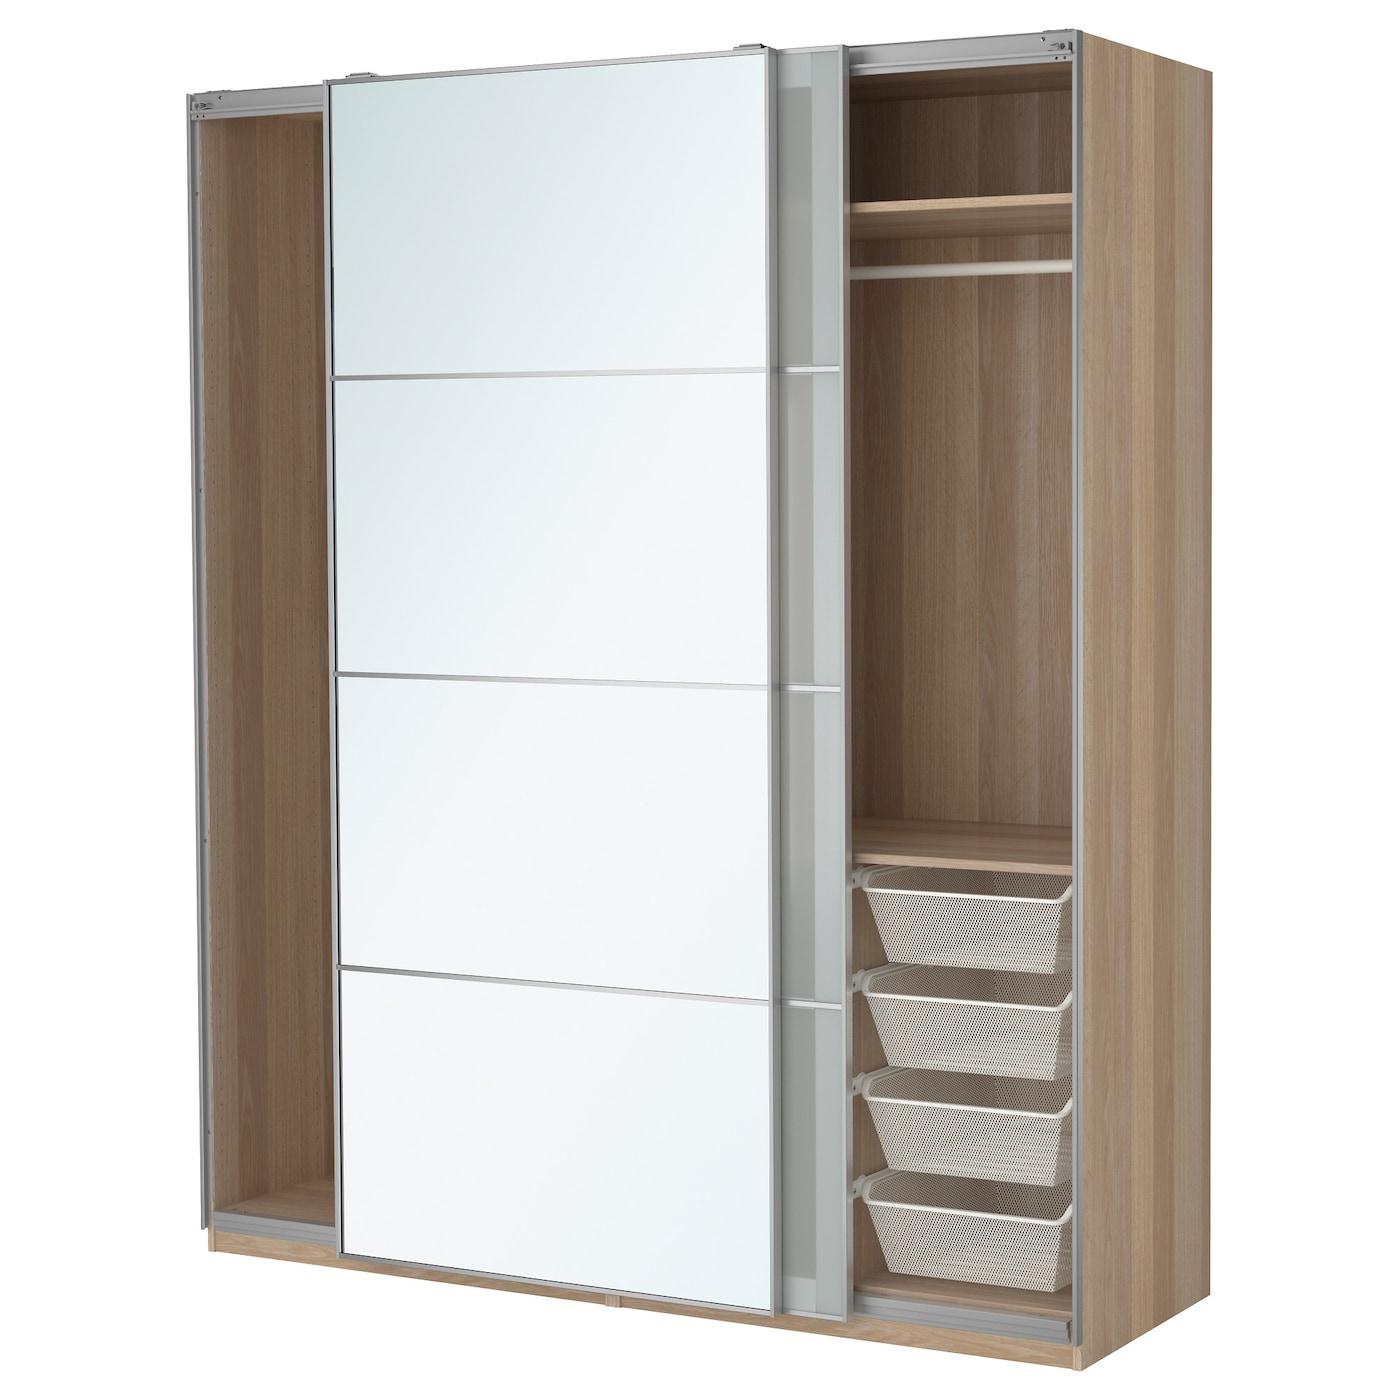 wardrobe combinations with doors ikea. Black Bedroom Furniture Sets. Home Design Ideas